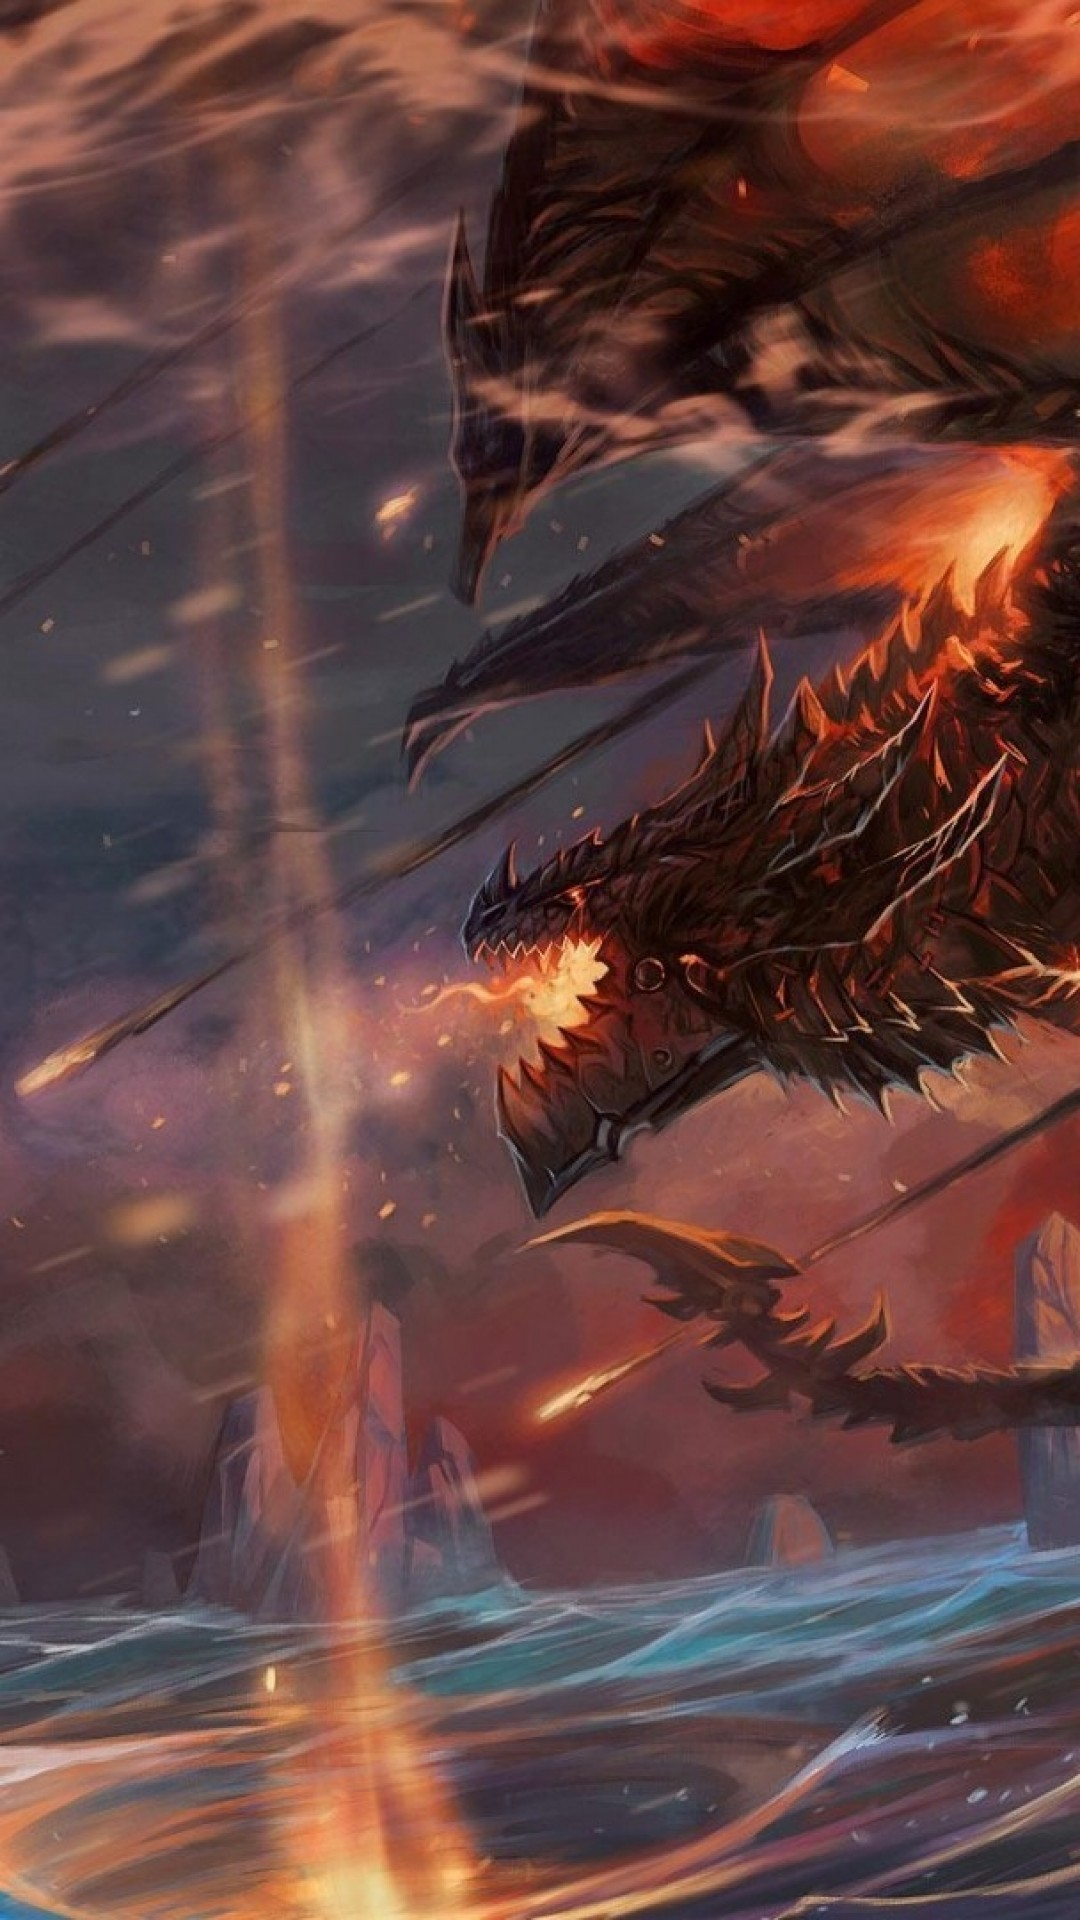 World Of Warcraft, Dragon, Lightning, Ocean, Flame, Artwork